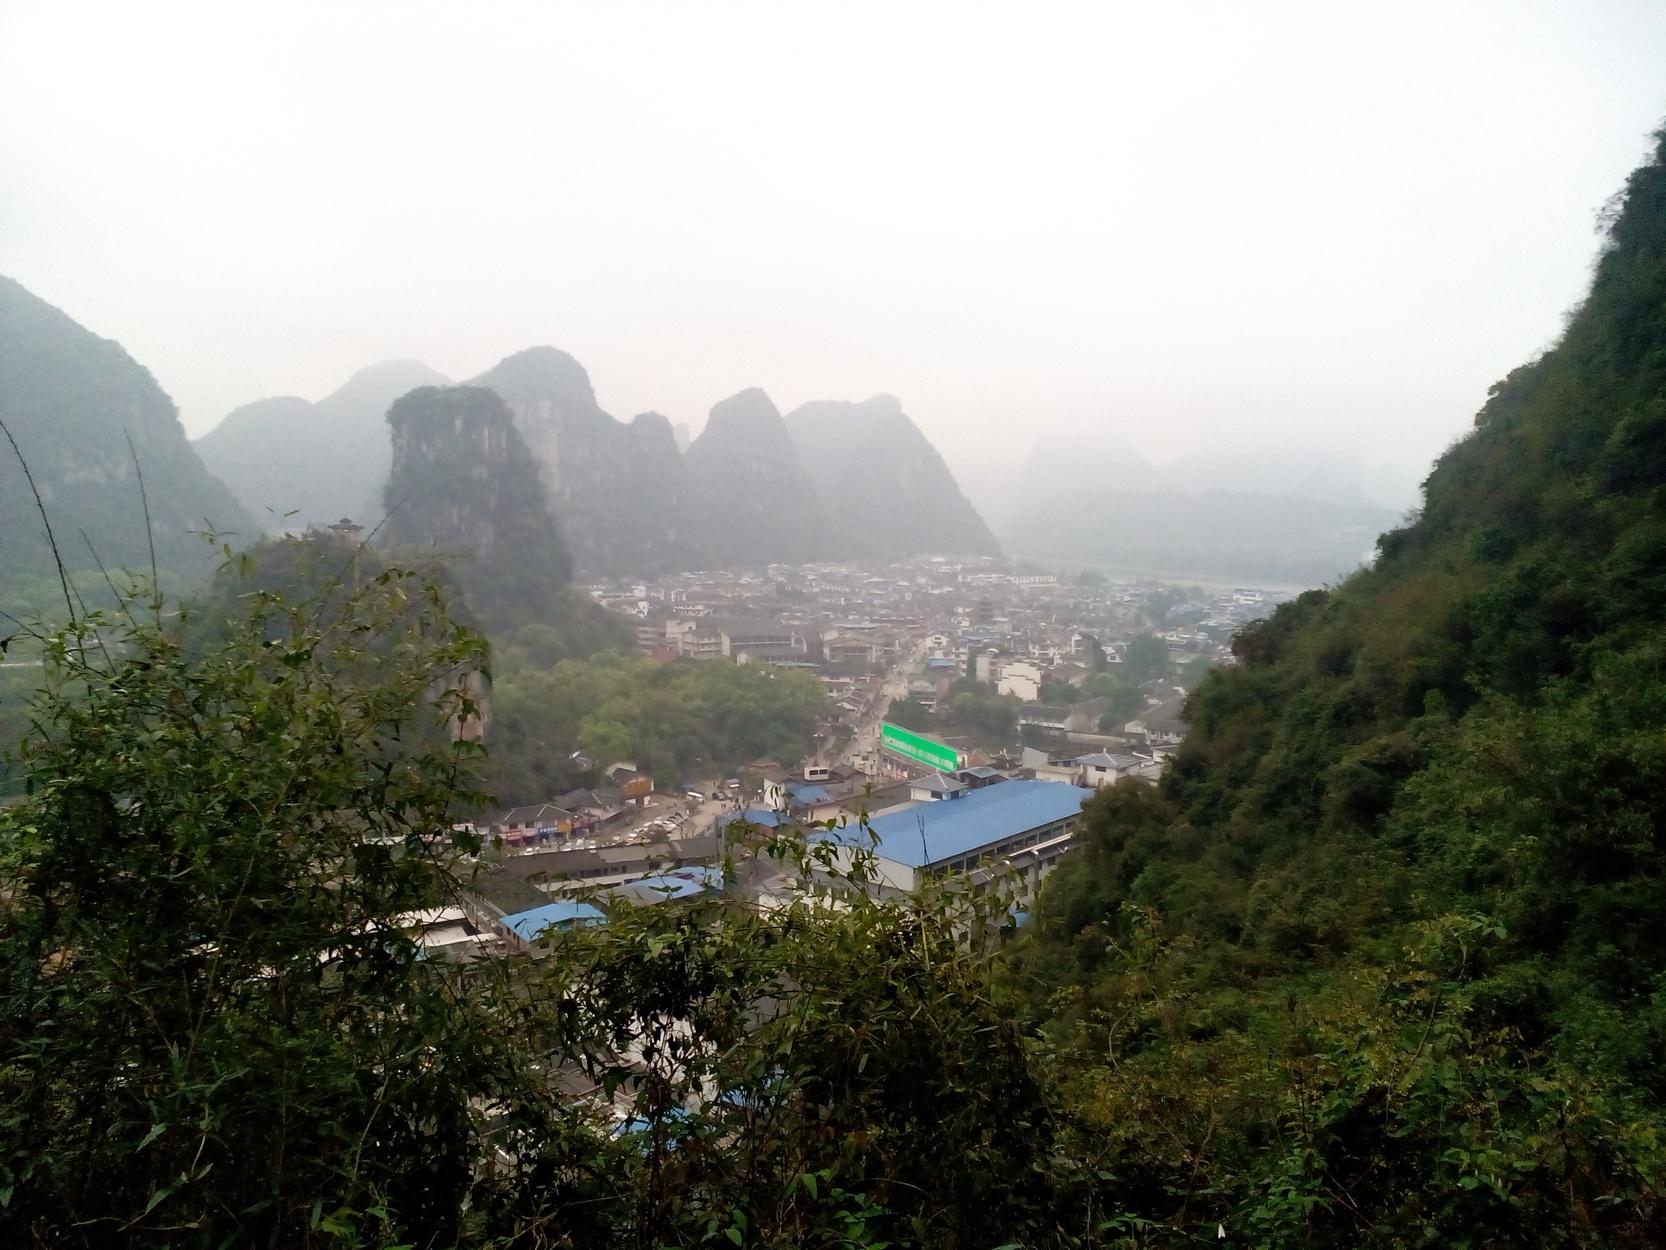 Village of Yangshuo, guangxi, China, Panorama